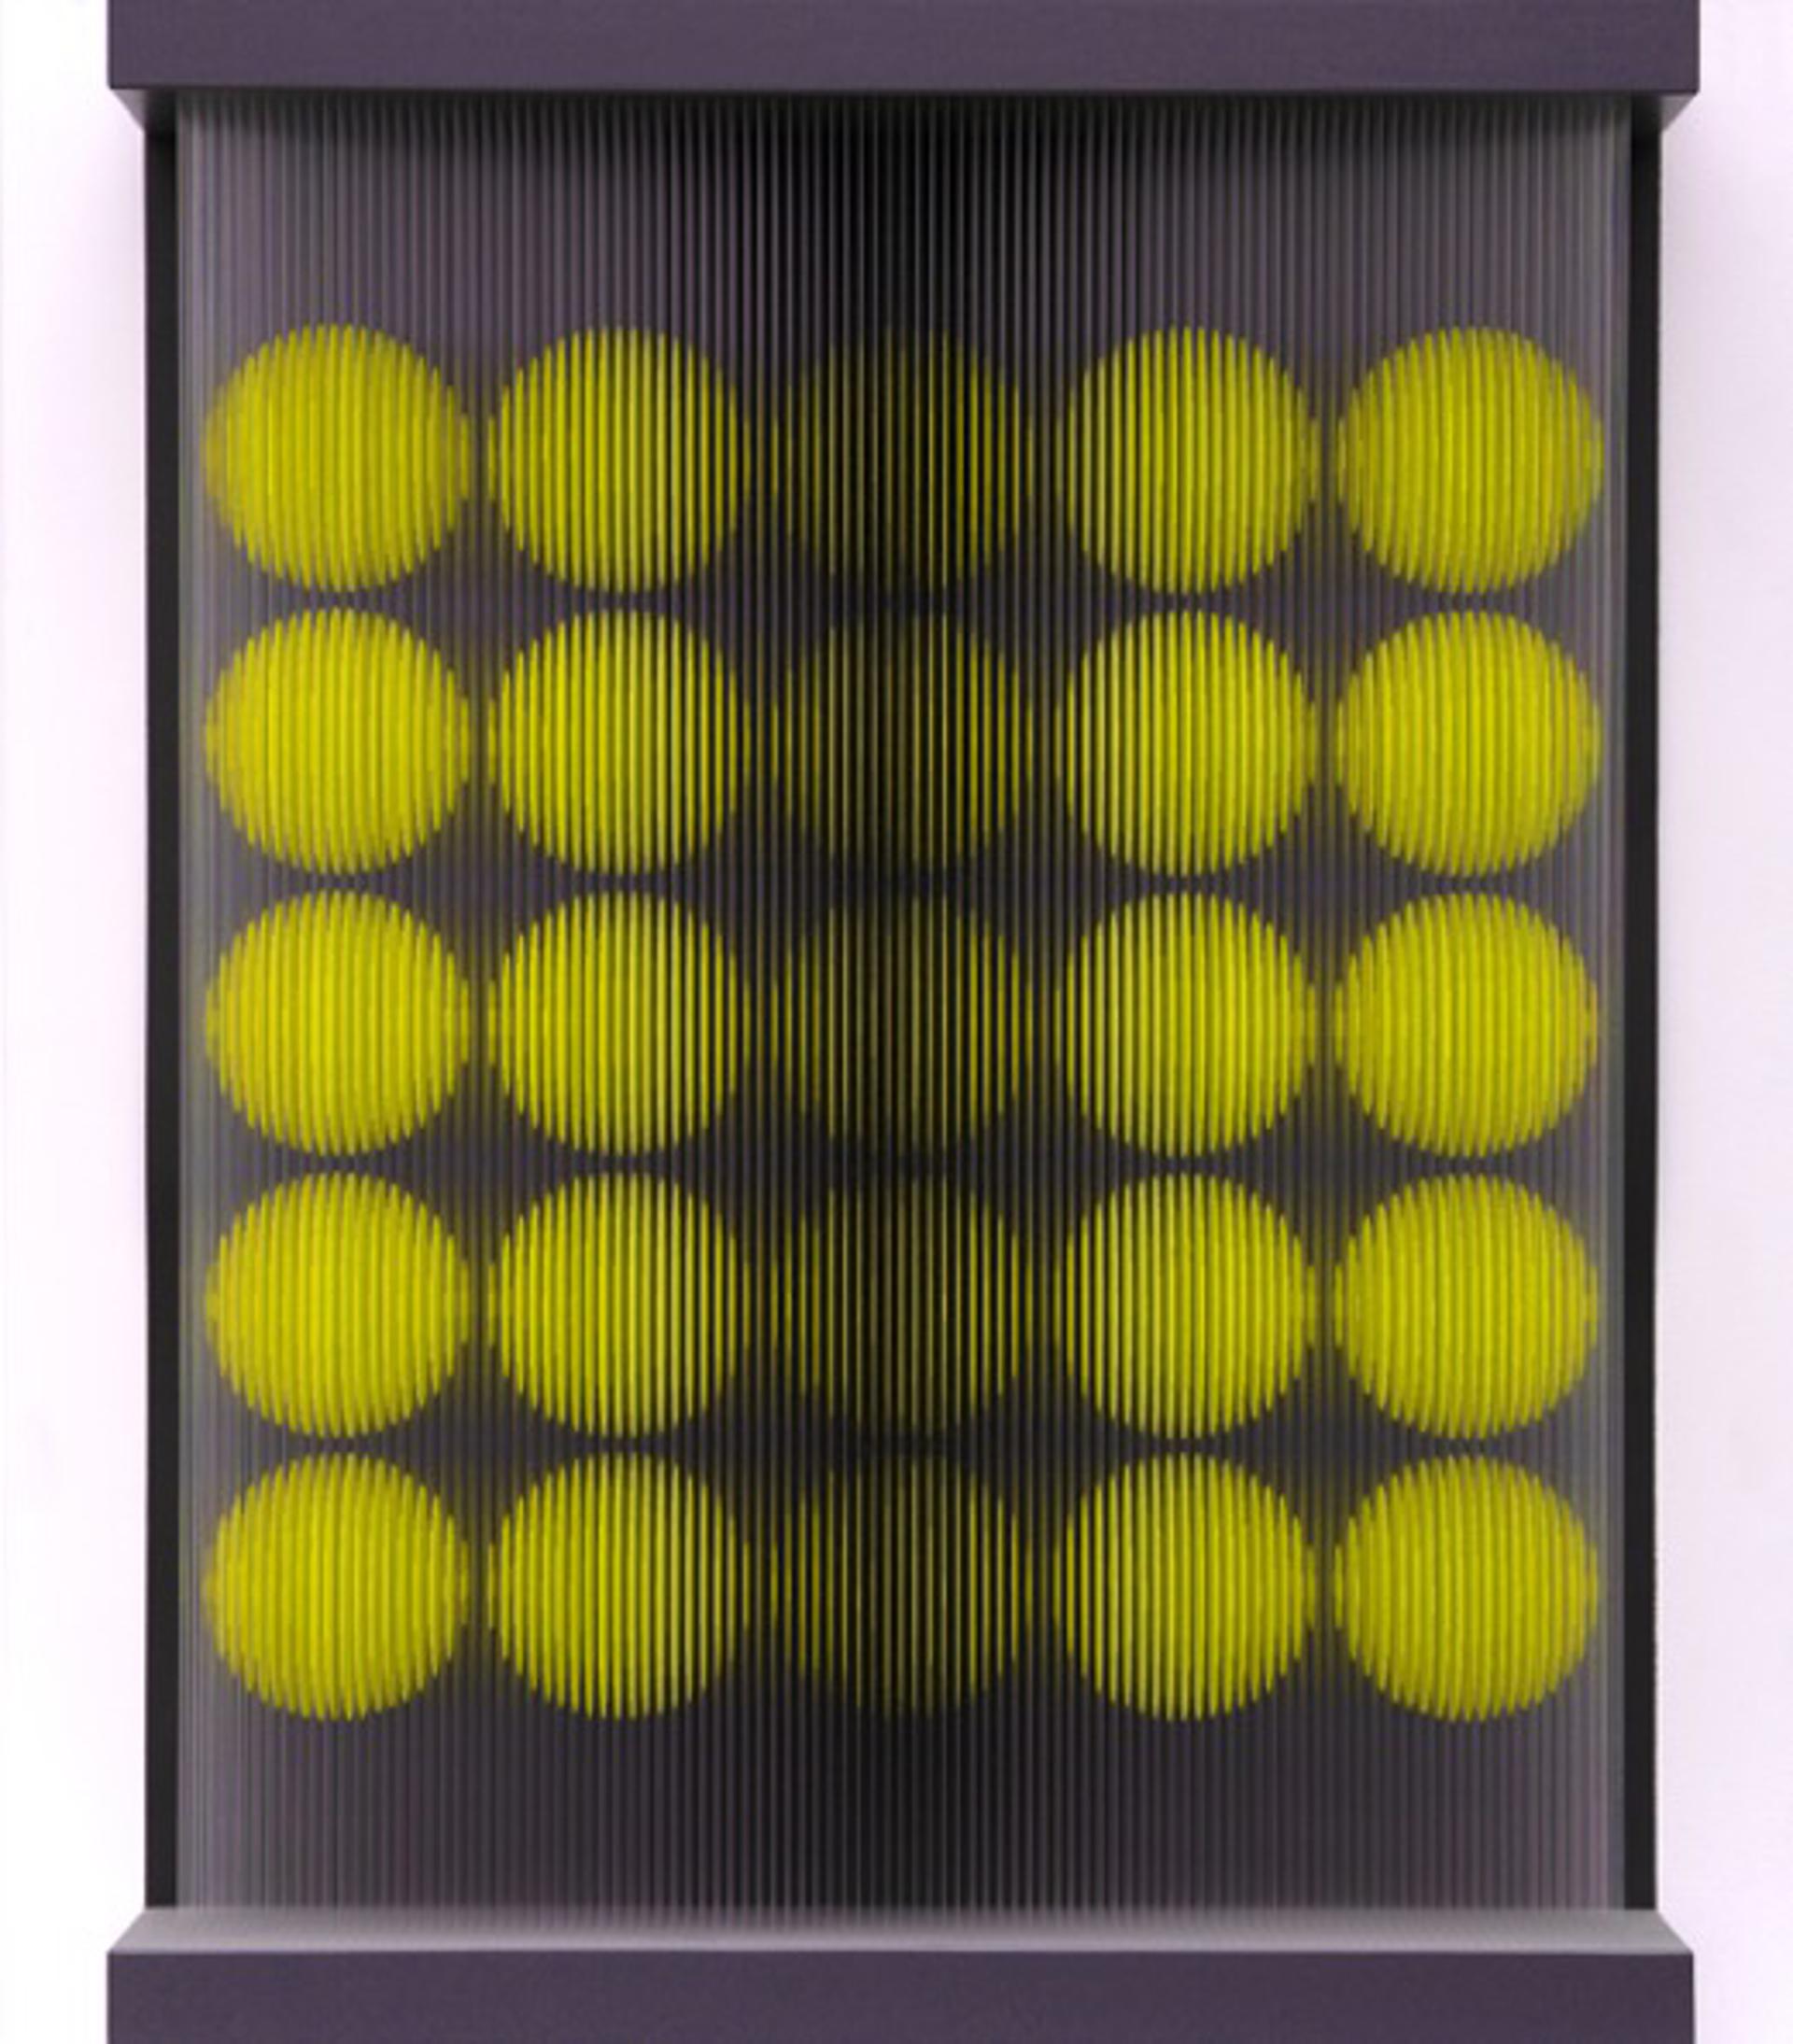 25 Gelbe Kugeln by Yoshiyuki Miura